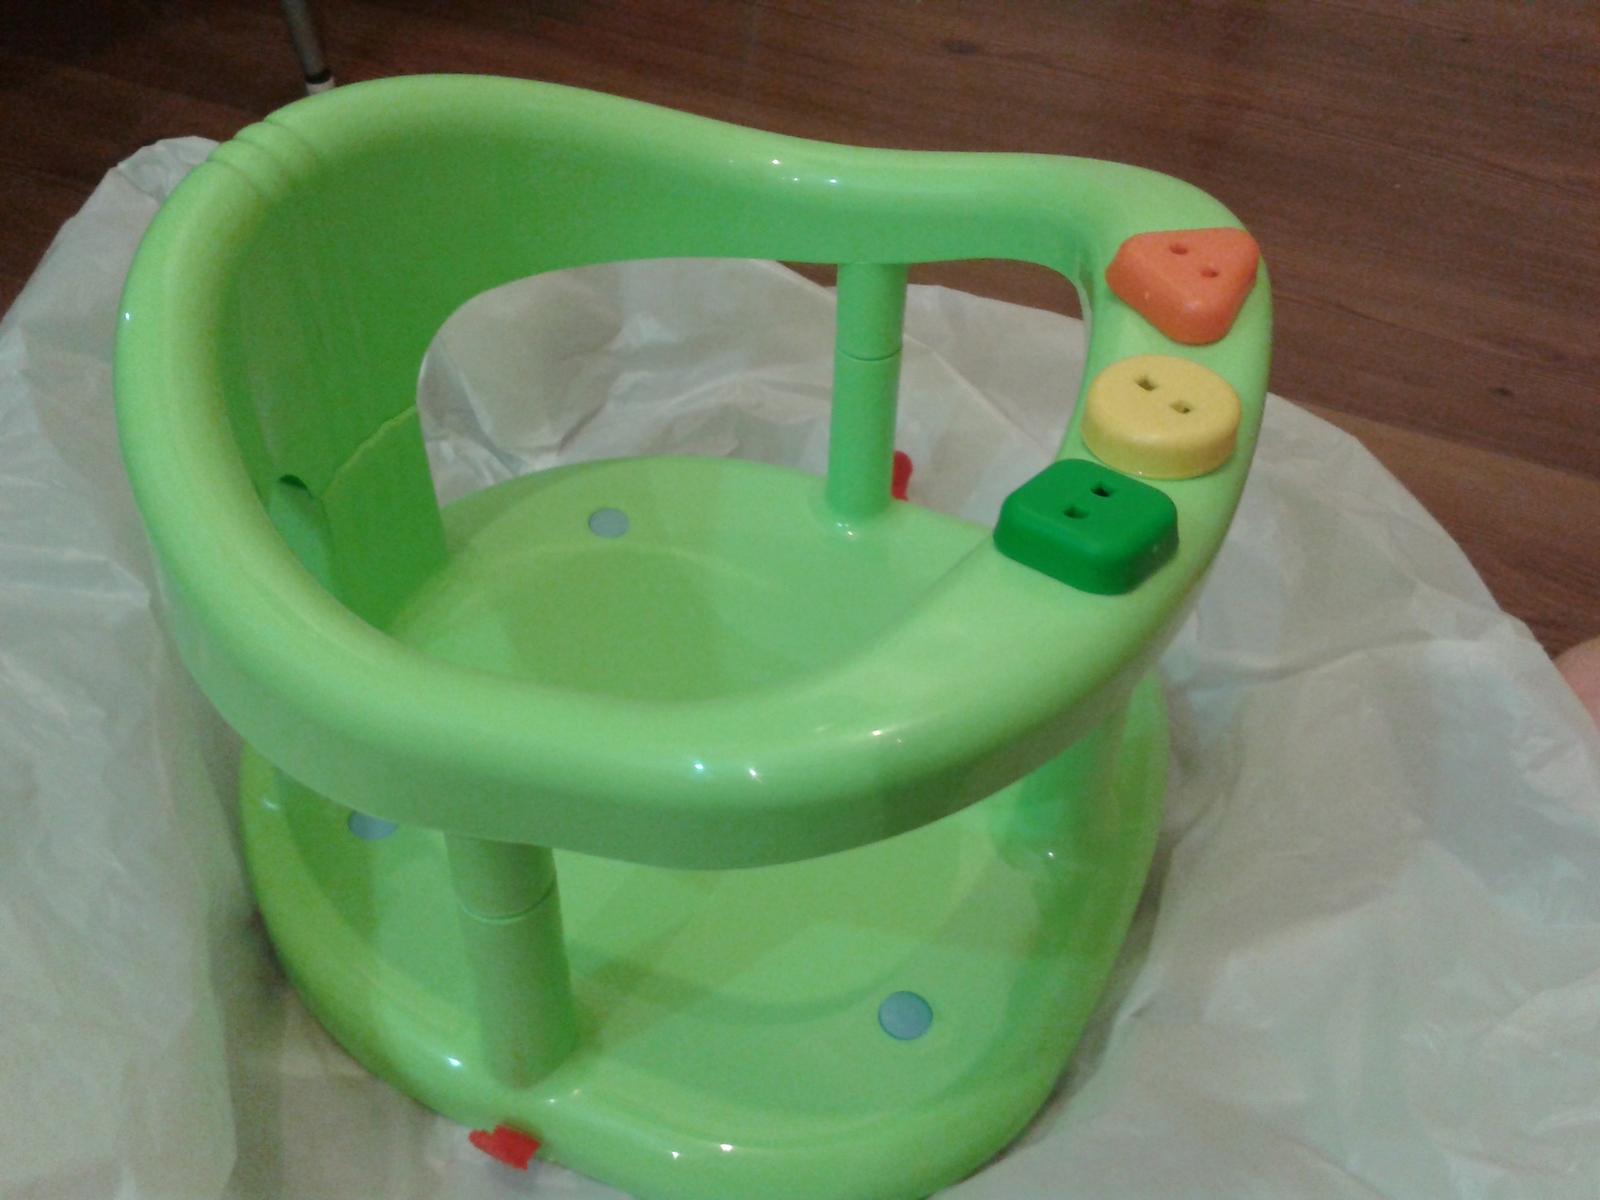 Baby Bath Tub Ring Seat Keter New and 50 similar items